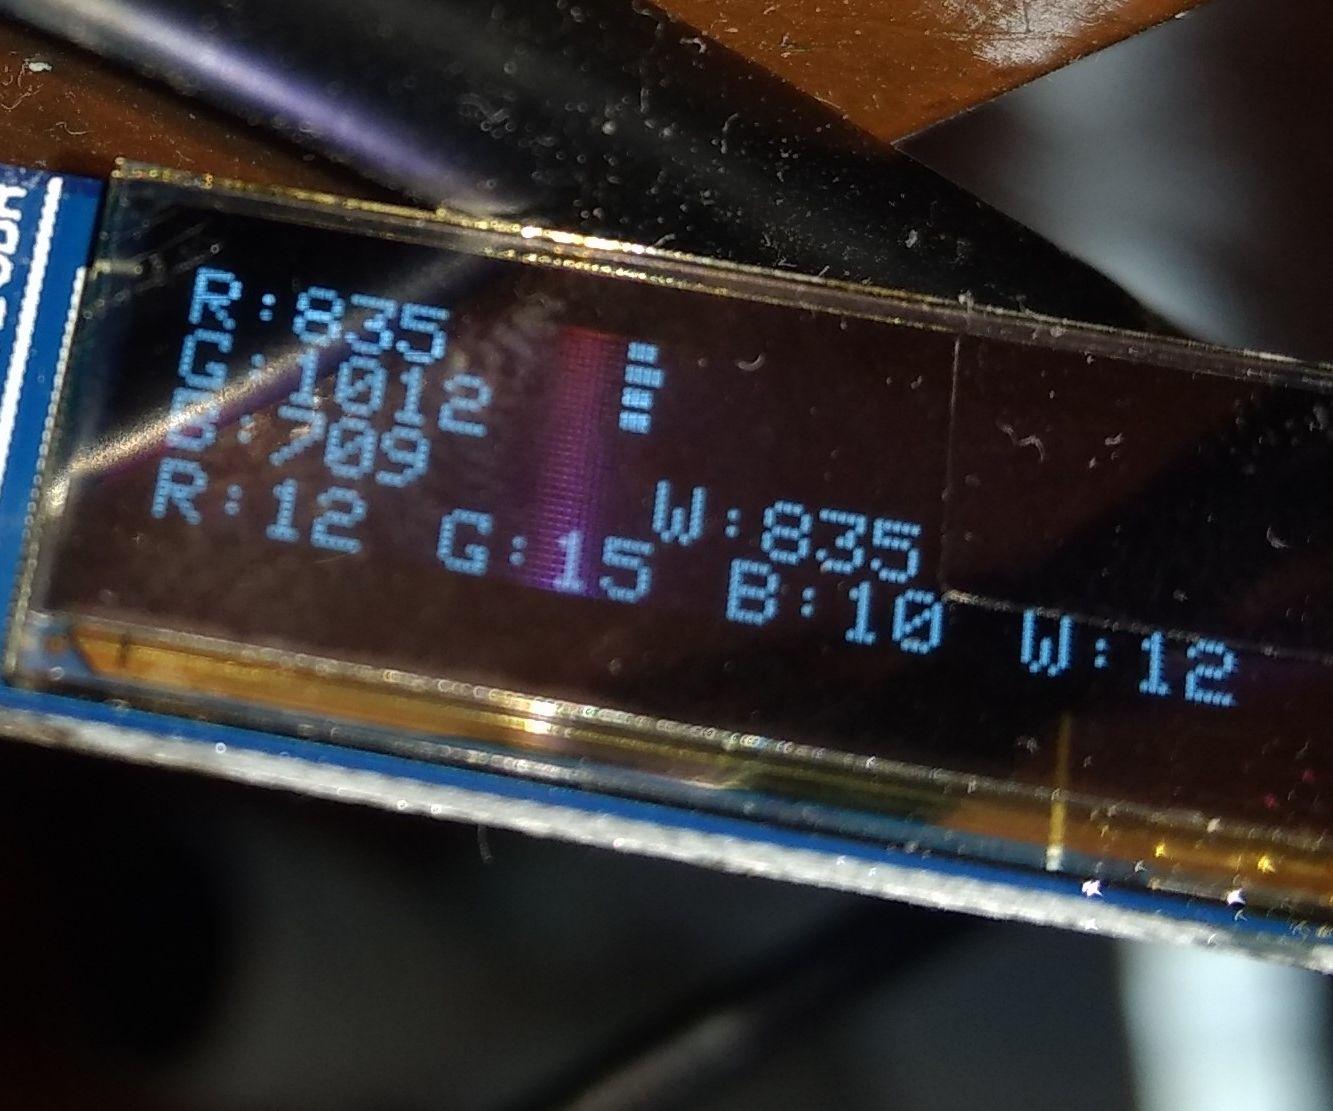 Lux Meter Using VELM6040